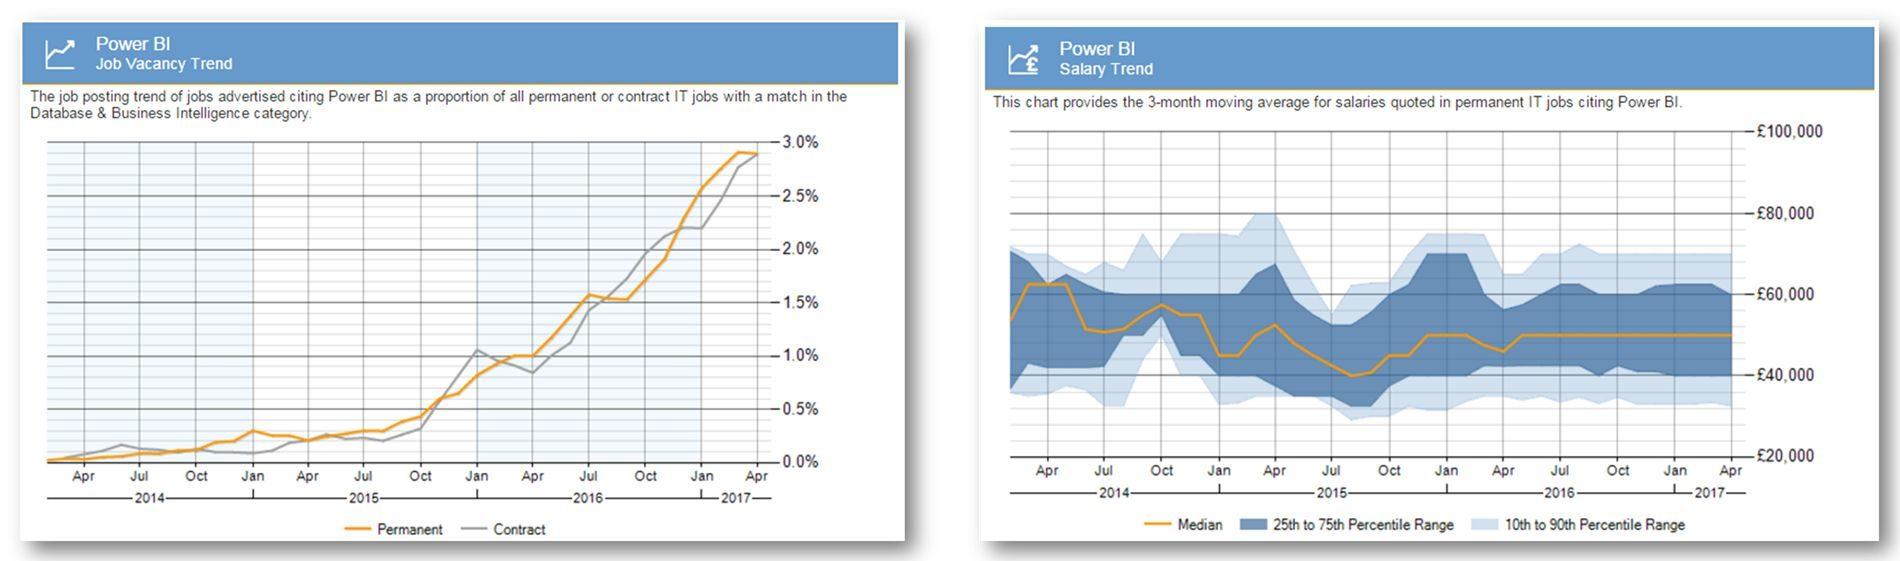 Power BI Trends - Power BI Interview Questions - Edureka